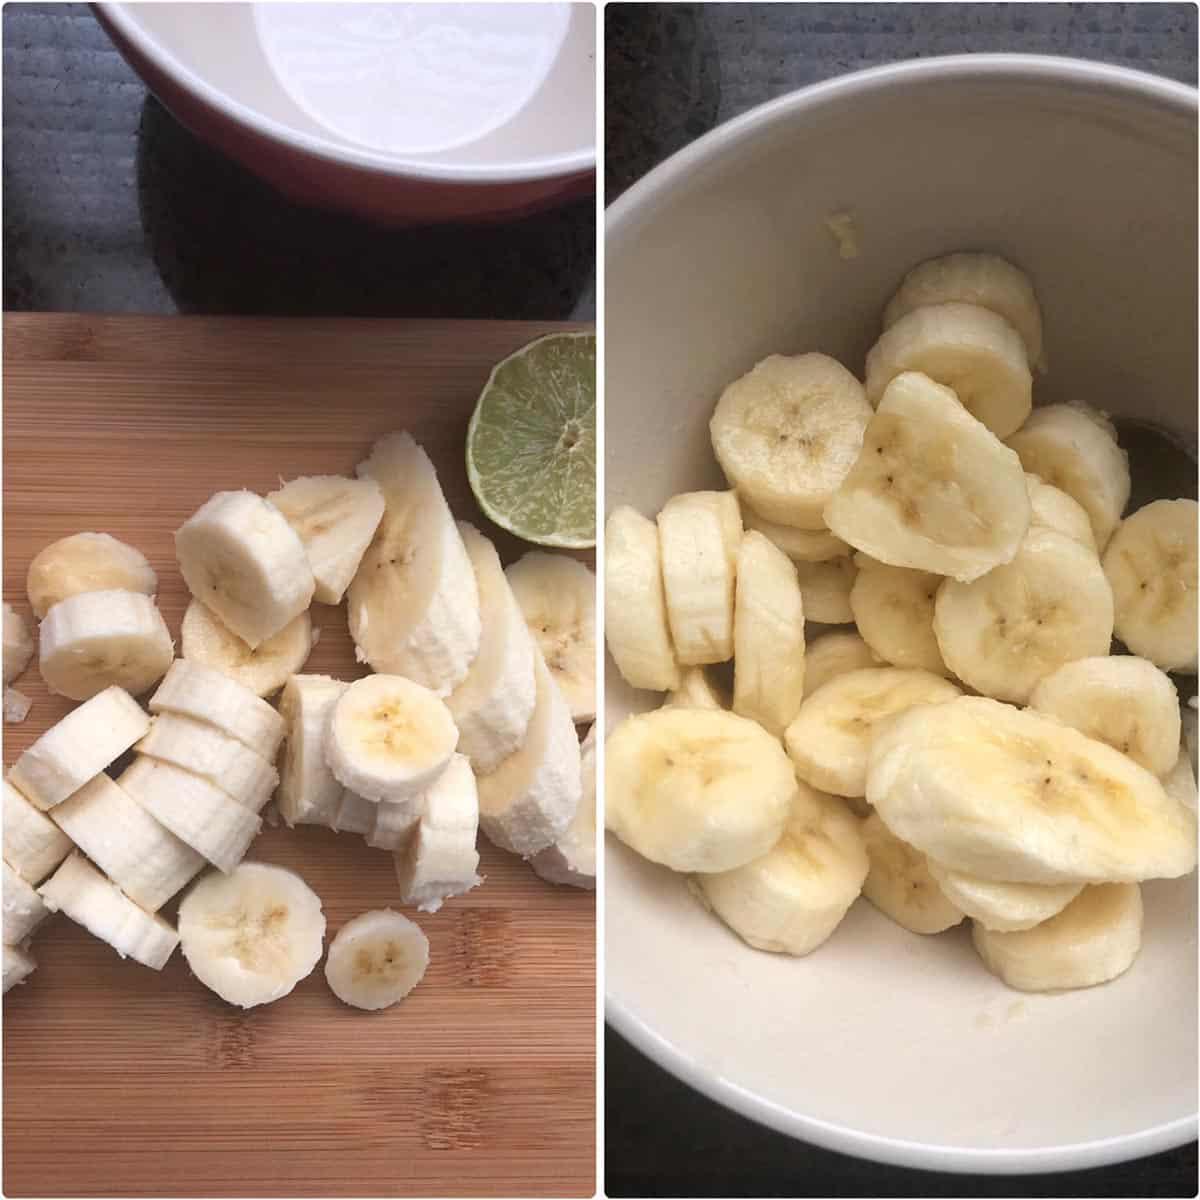 Chopped bananas tossed with lemon juice